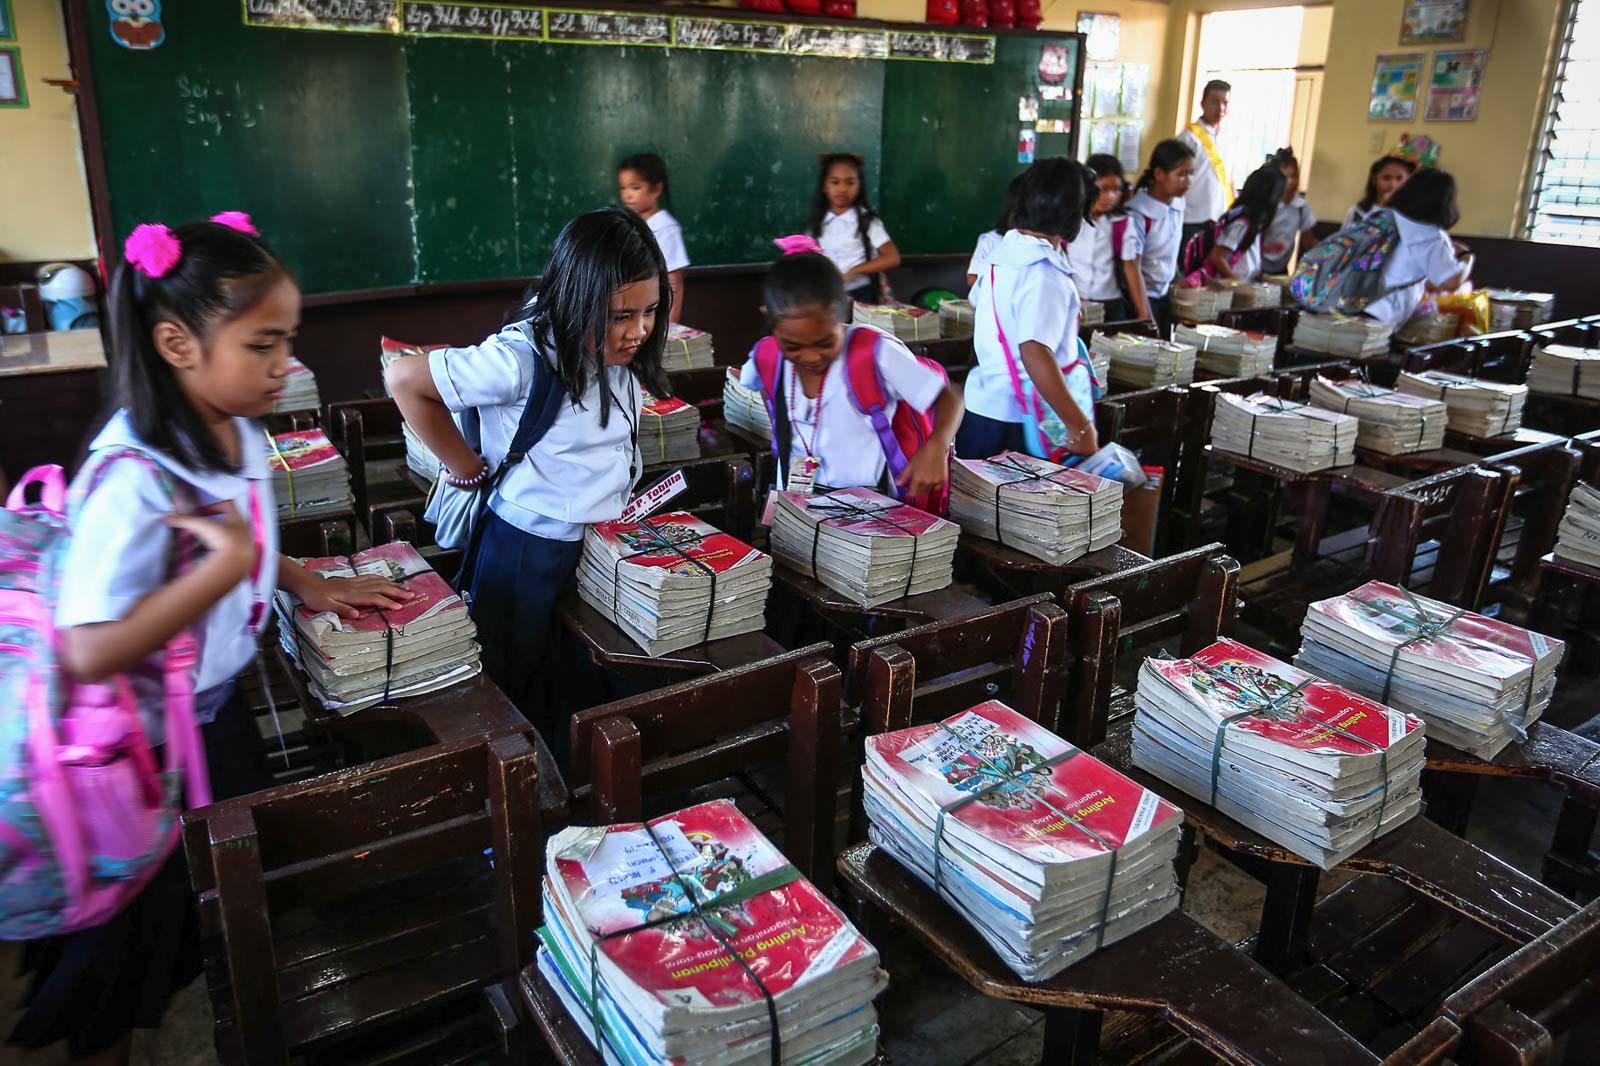 'NEW'. Students of the Corazon Aquino Elementary School in Quezon City receive their books.